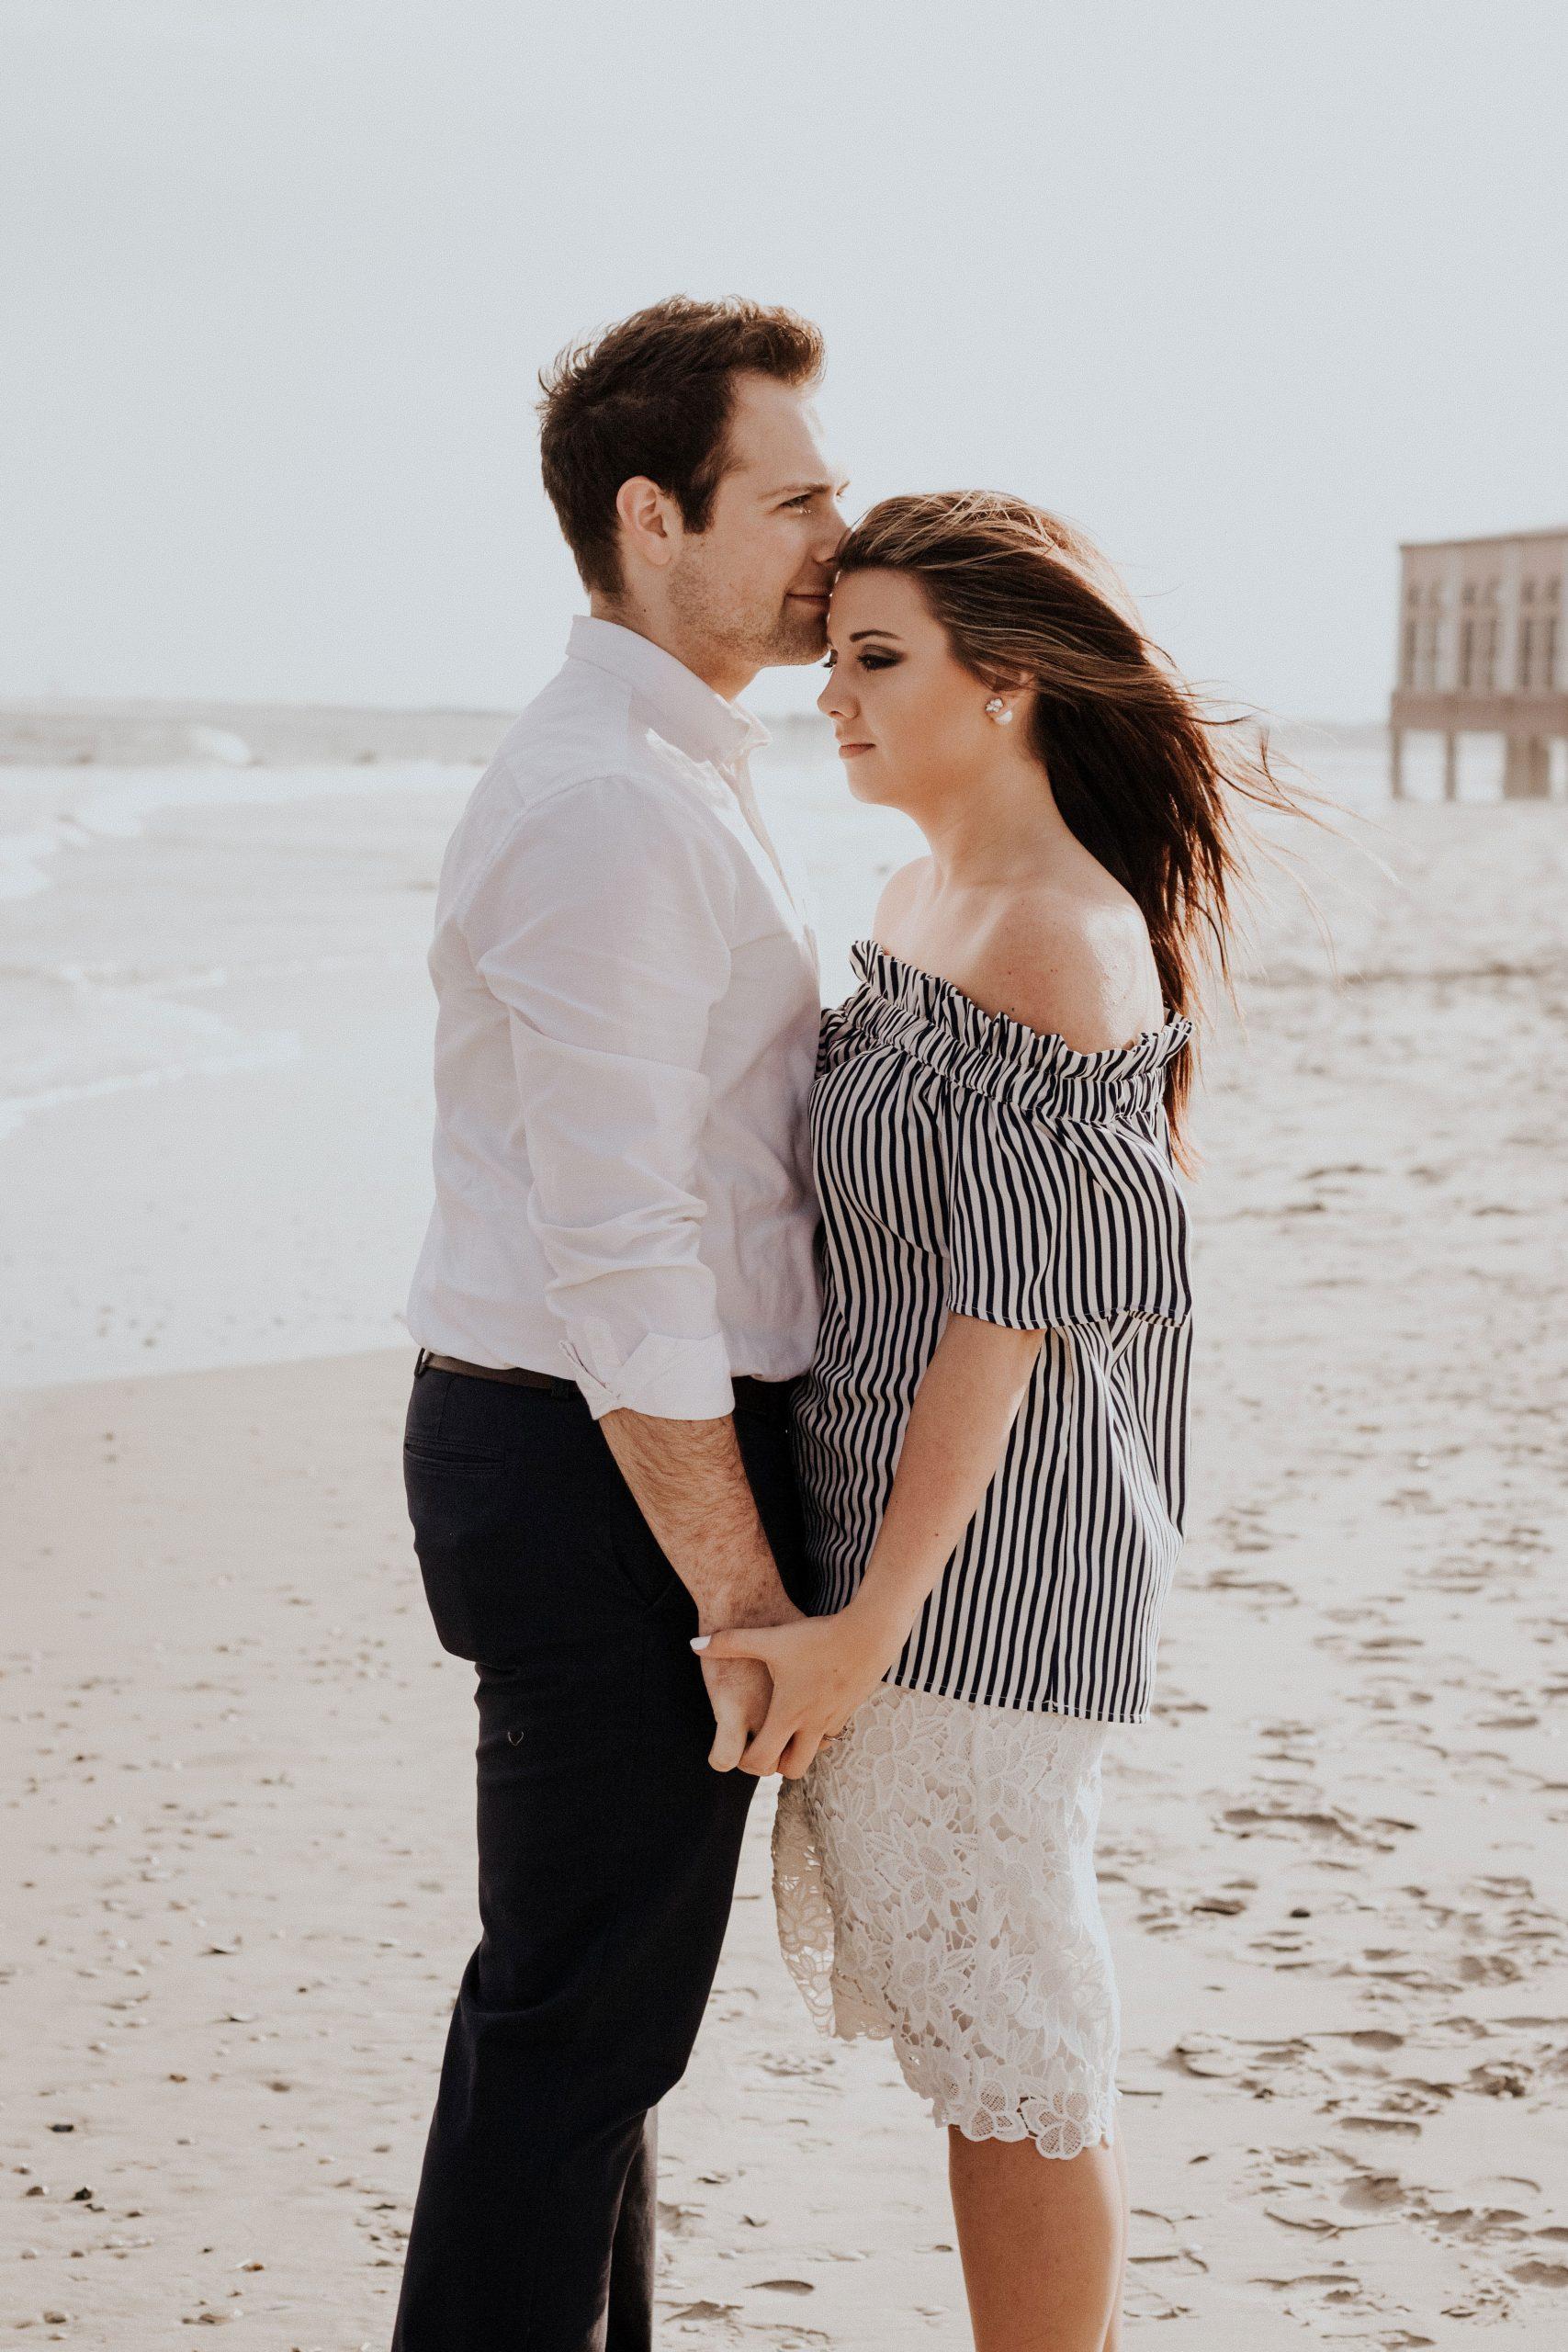 Love Couple Sad Dp Images photo pics for hd download